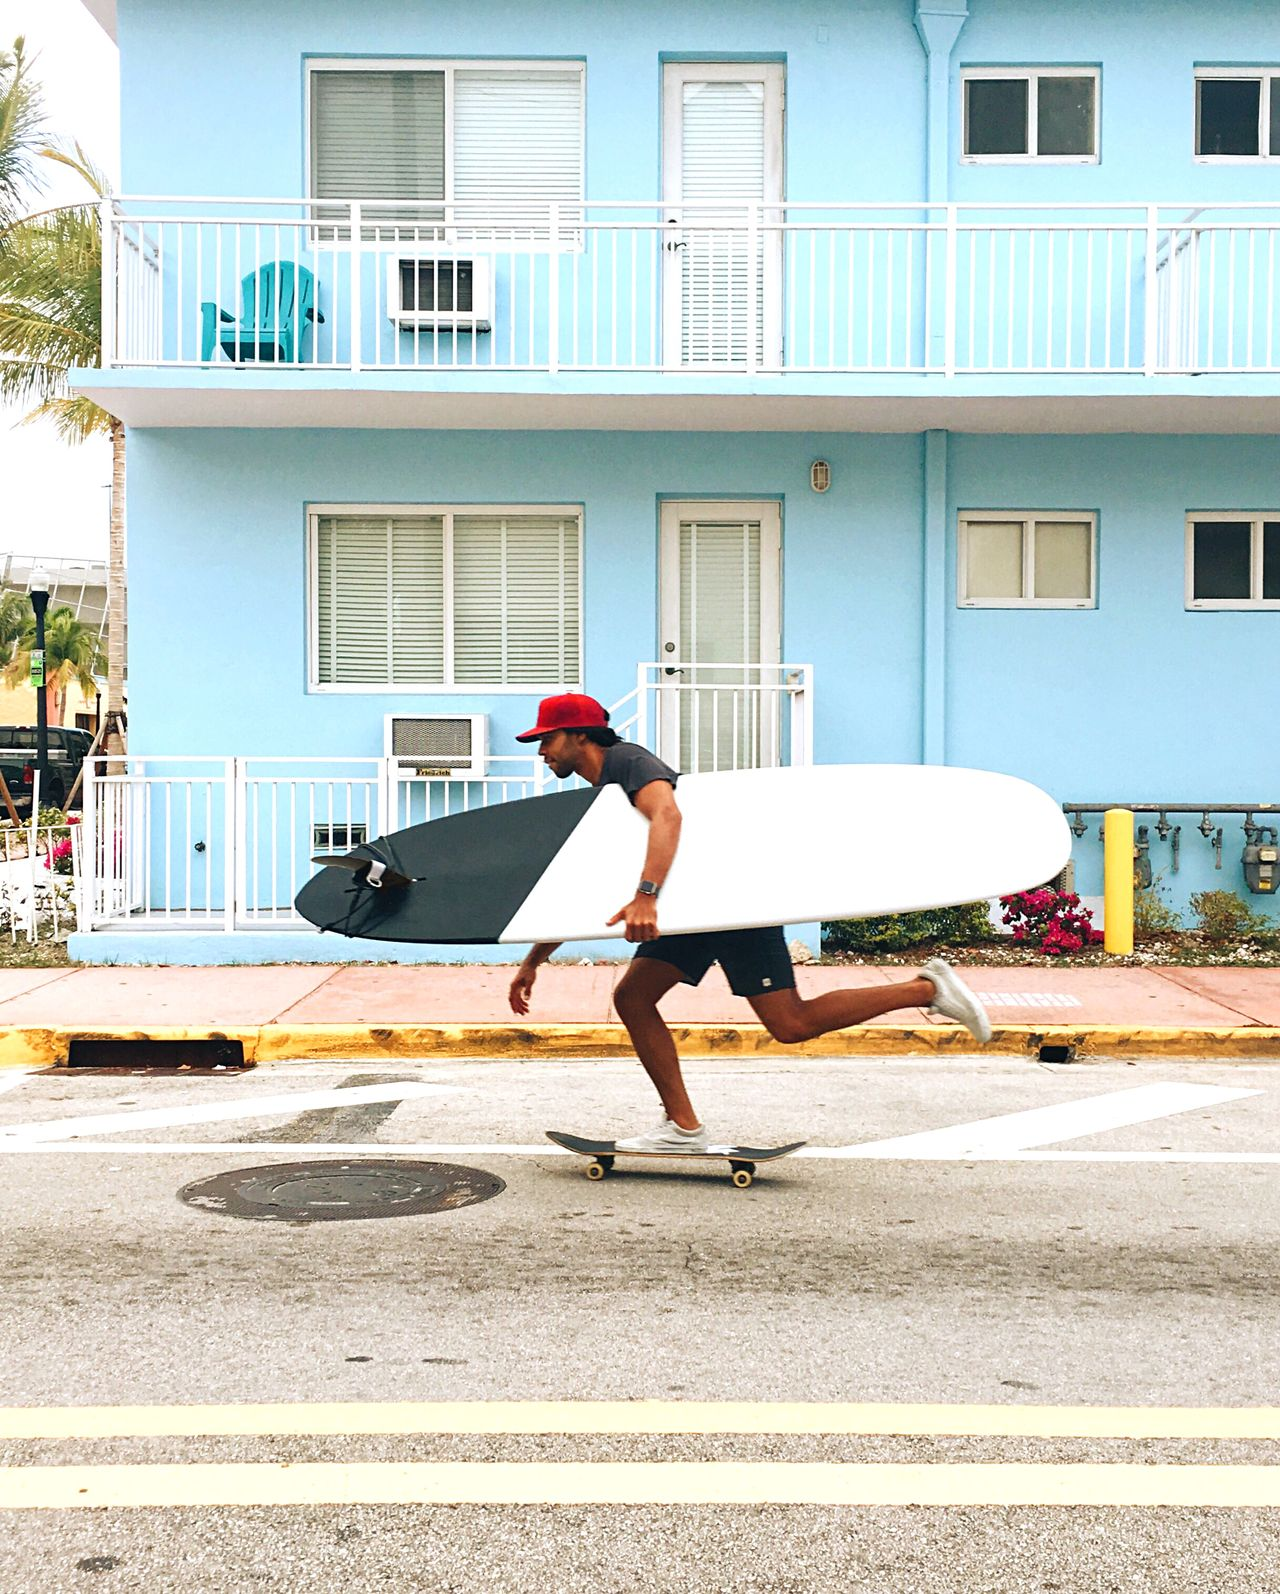 SIDE VIEW OF MAN SKATEBOARDING ON ROAD AGAINST BUILDINGS